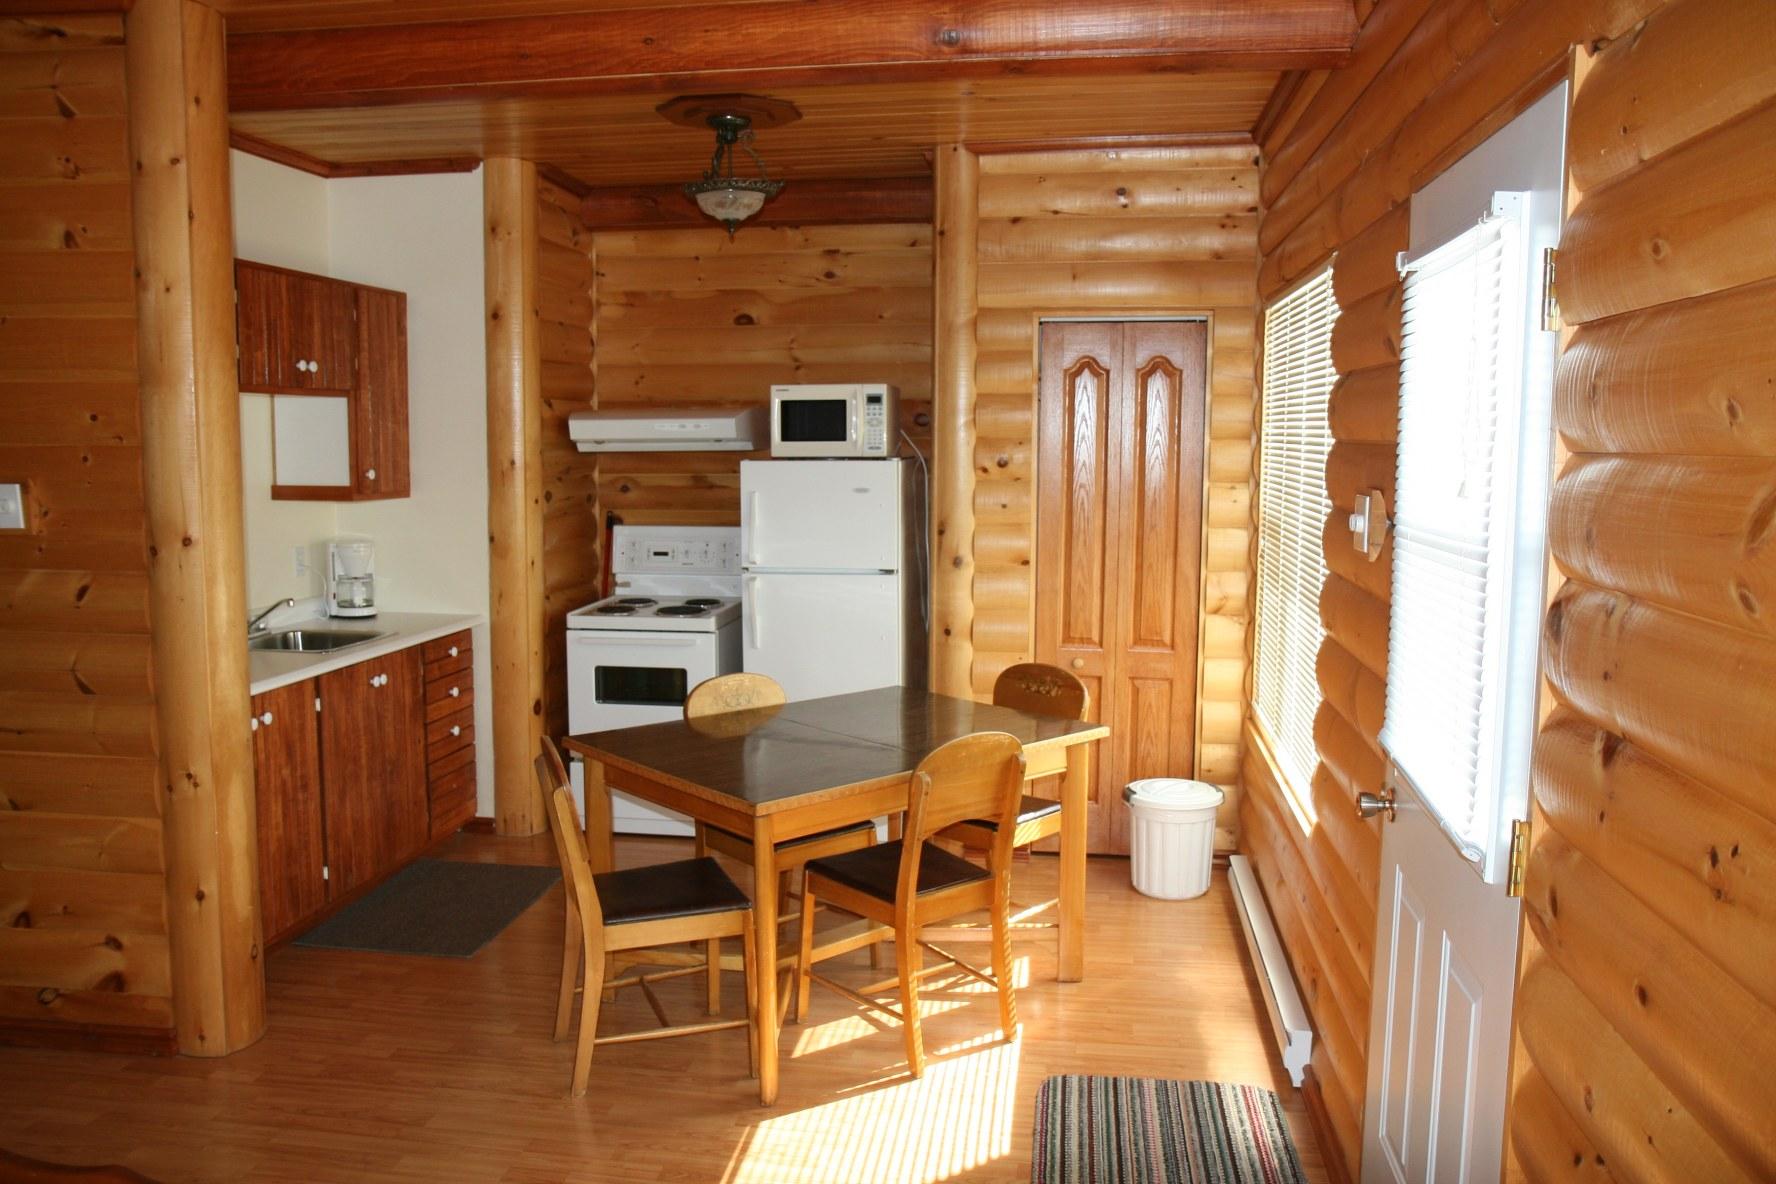 chalet-motel-st-simeon-charlevoix-interieur-chambre-bofleuve